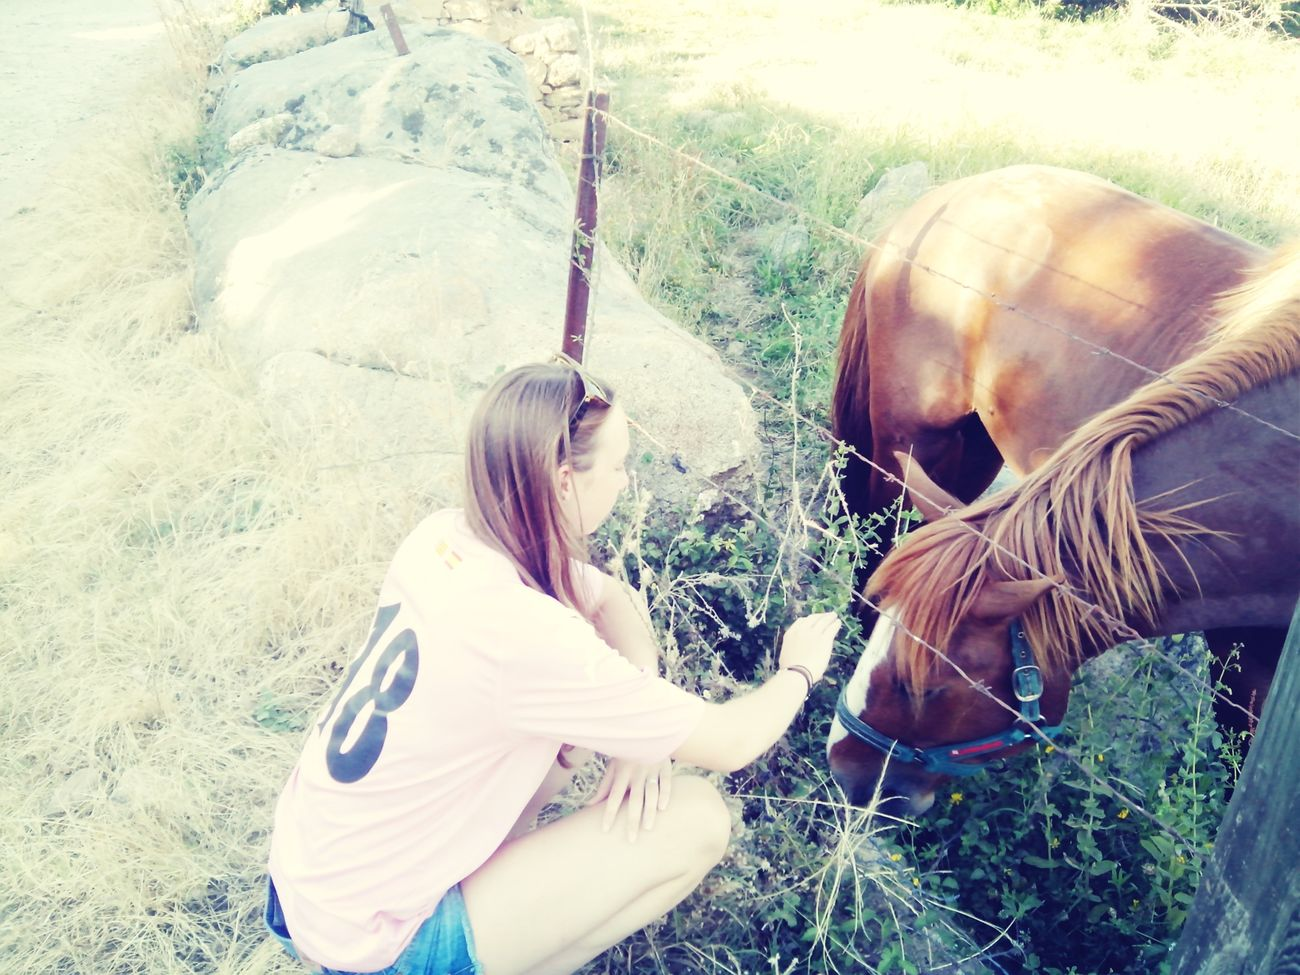 Thats Me ♥ Hello ❤ I Love Horses